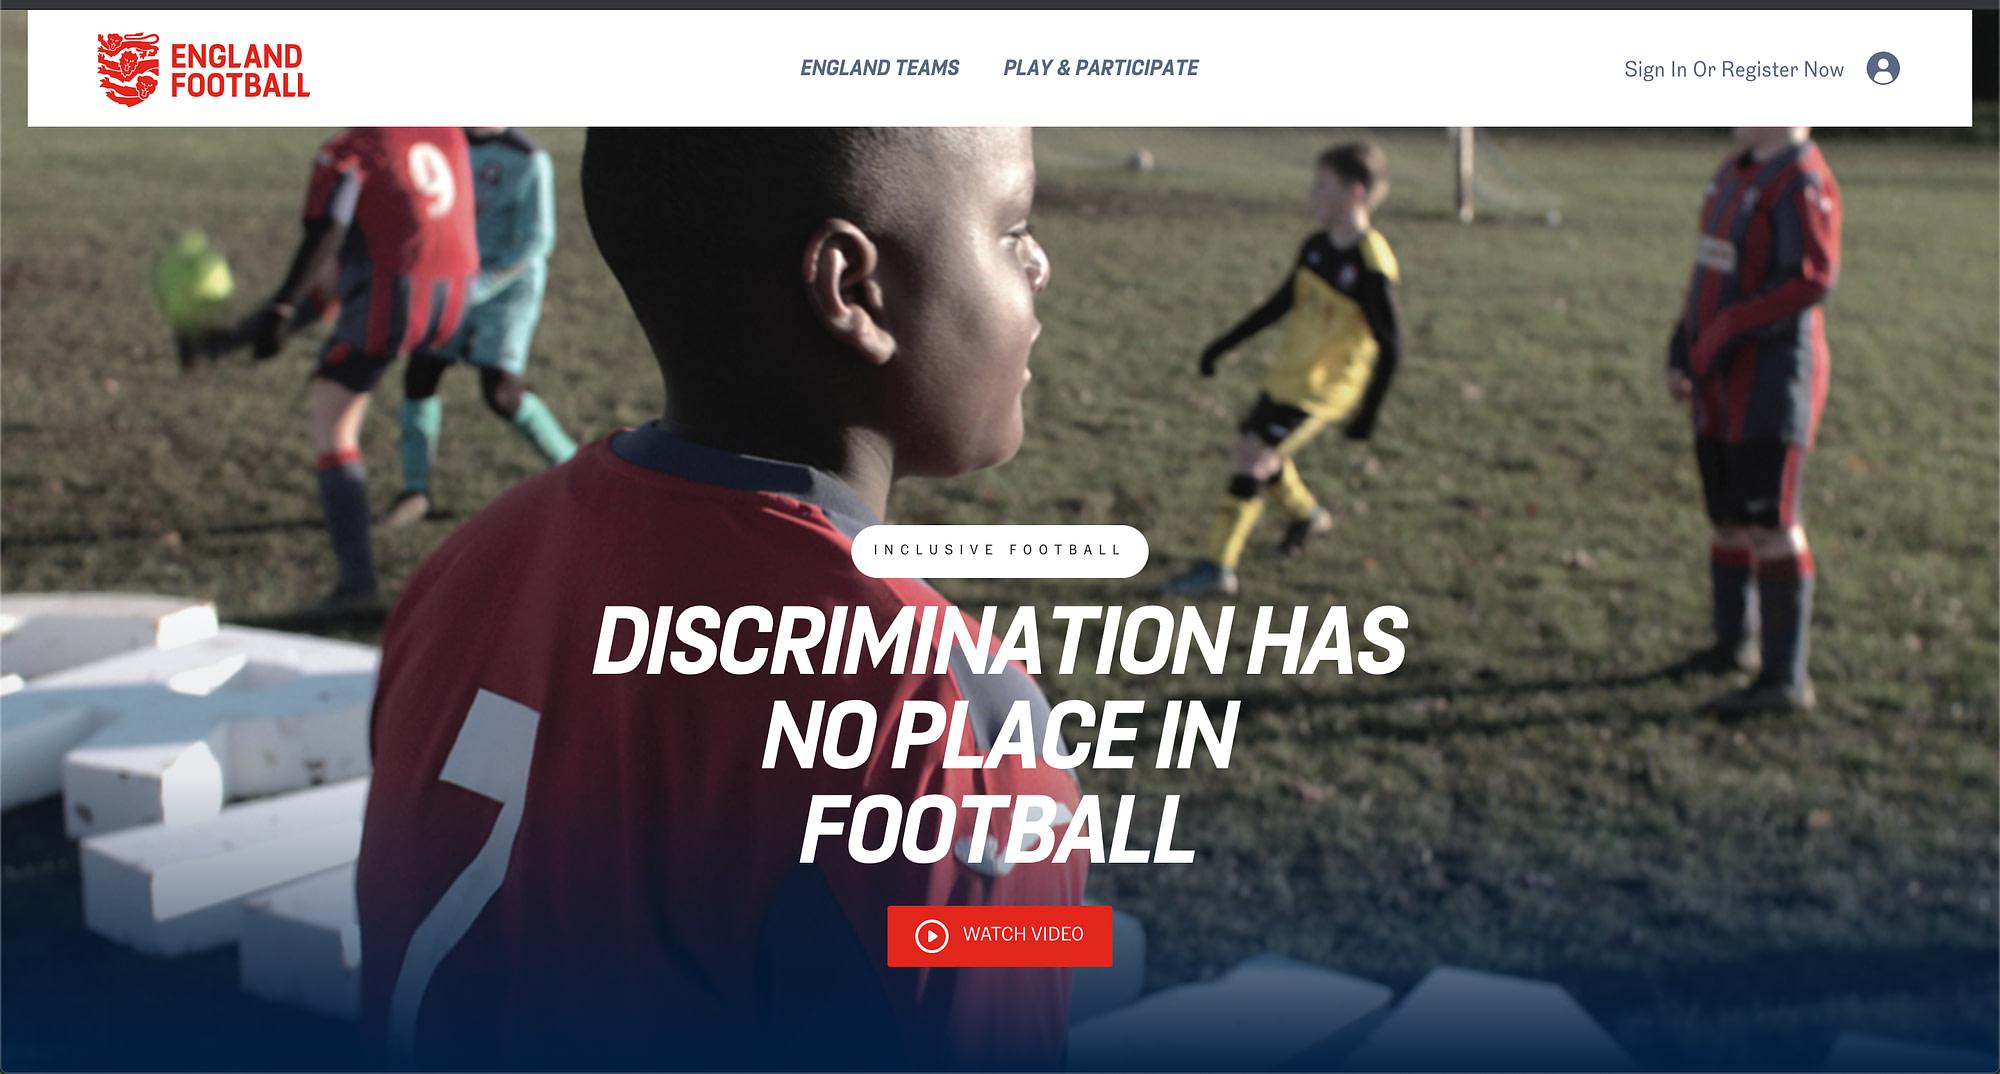 england football new website anti discrimination